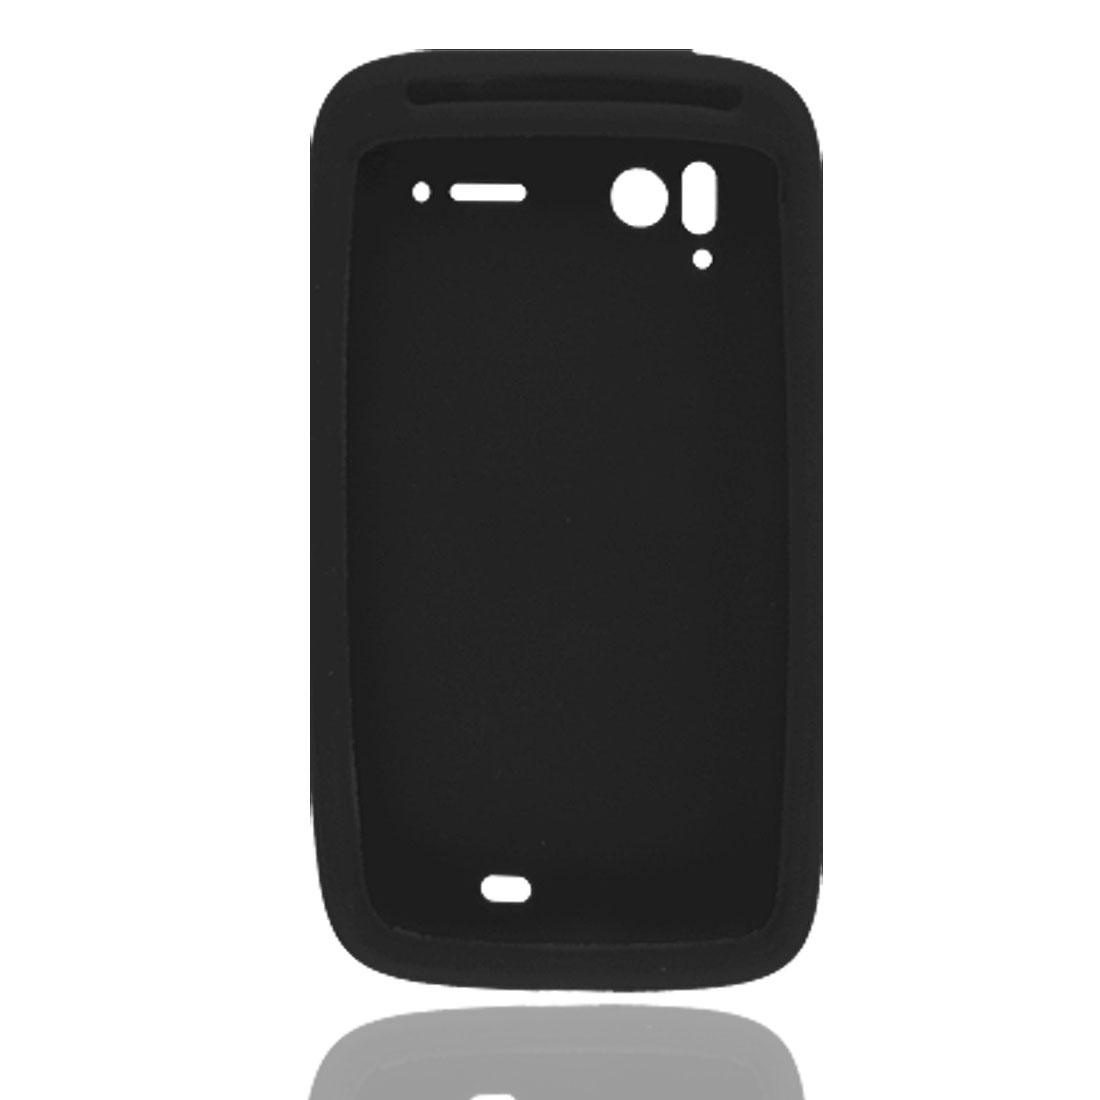 Black Silicone Skin Shield Case for HTC Sensation Pyramid